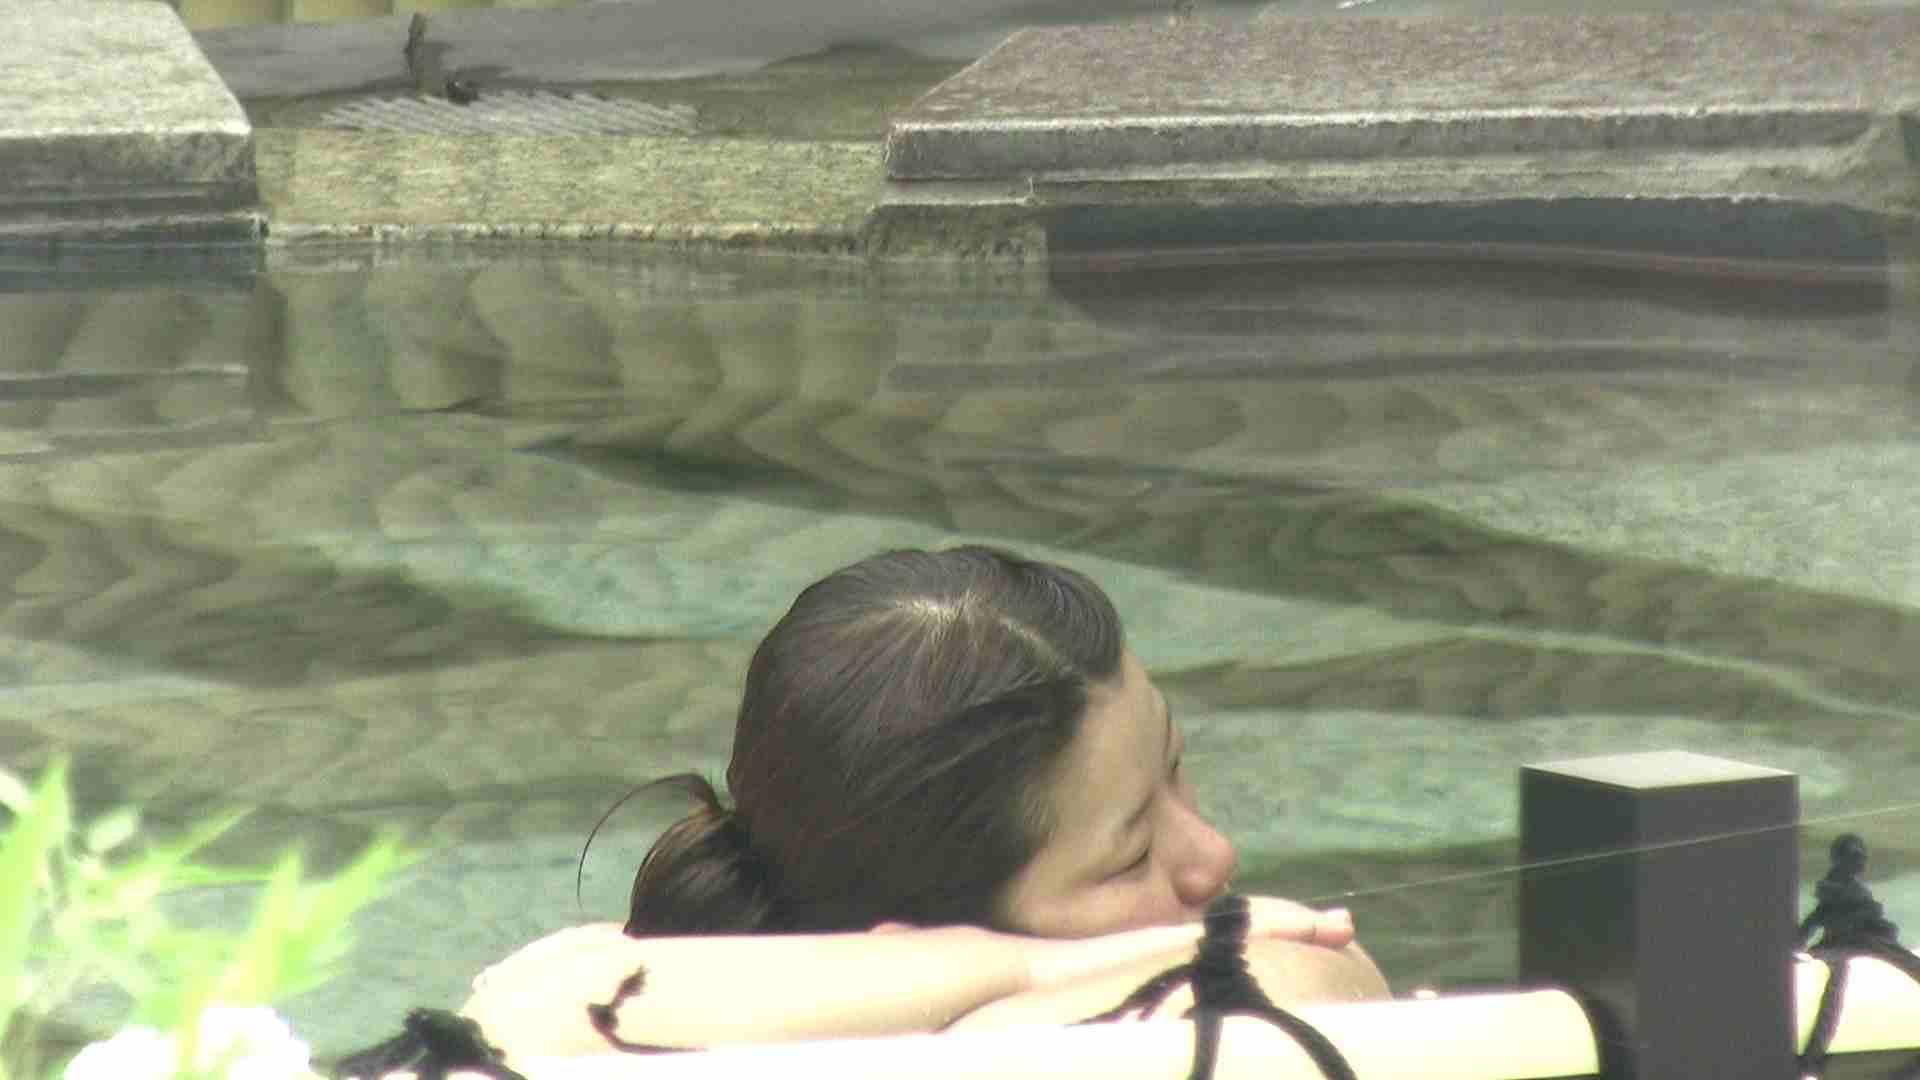 Aquaな露天風呂Vol.19【VIP】 盗撮 | HなOL  88pic 38